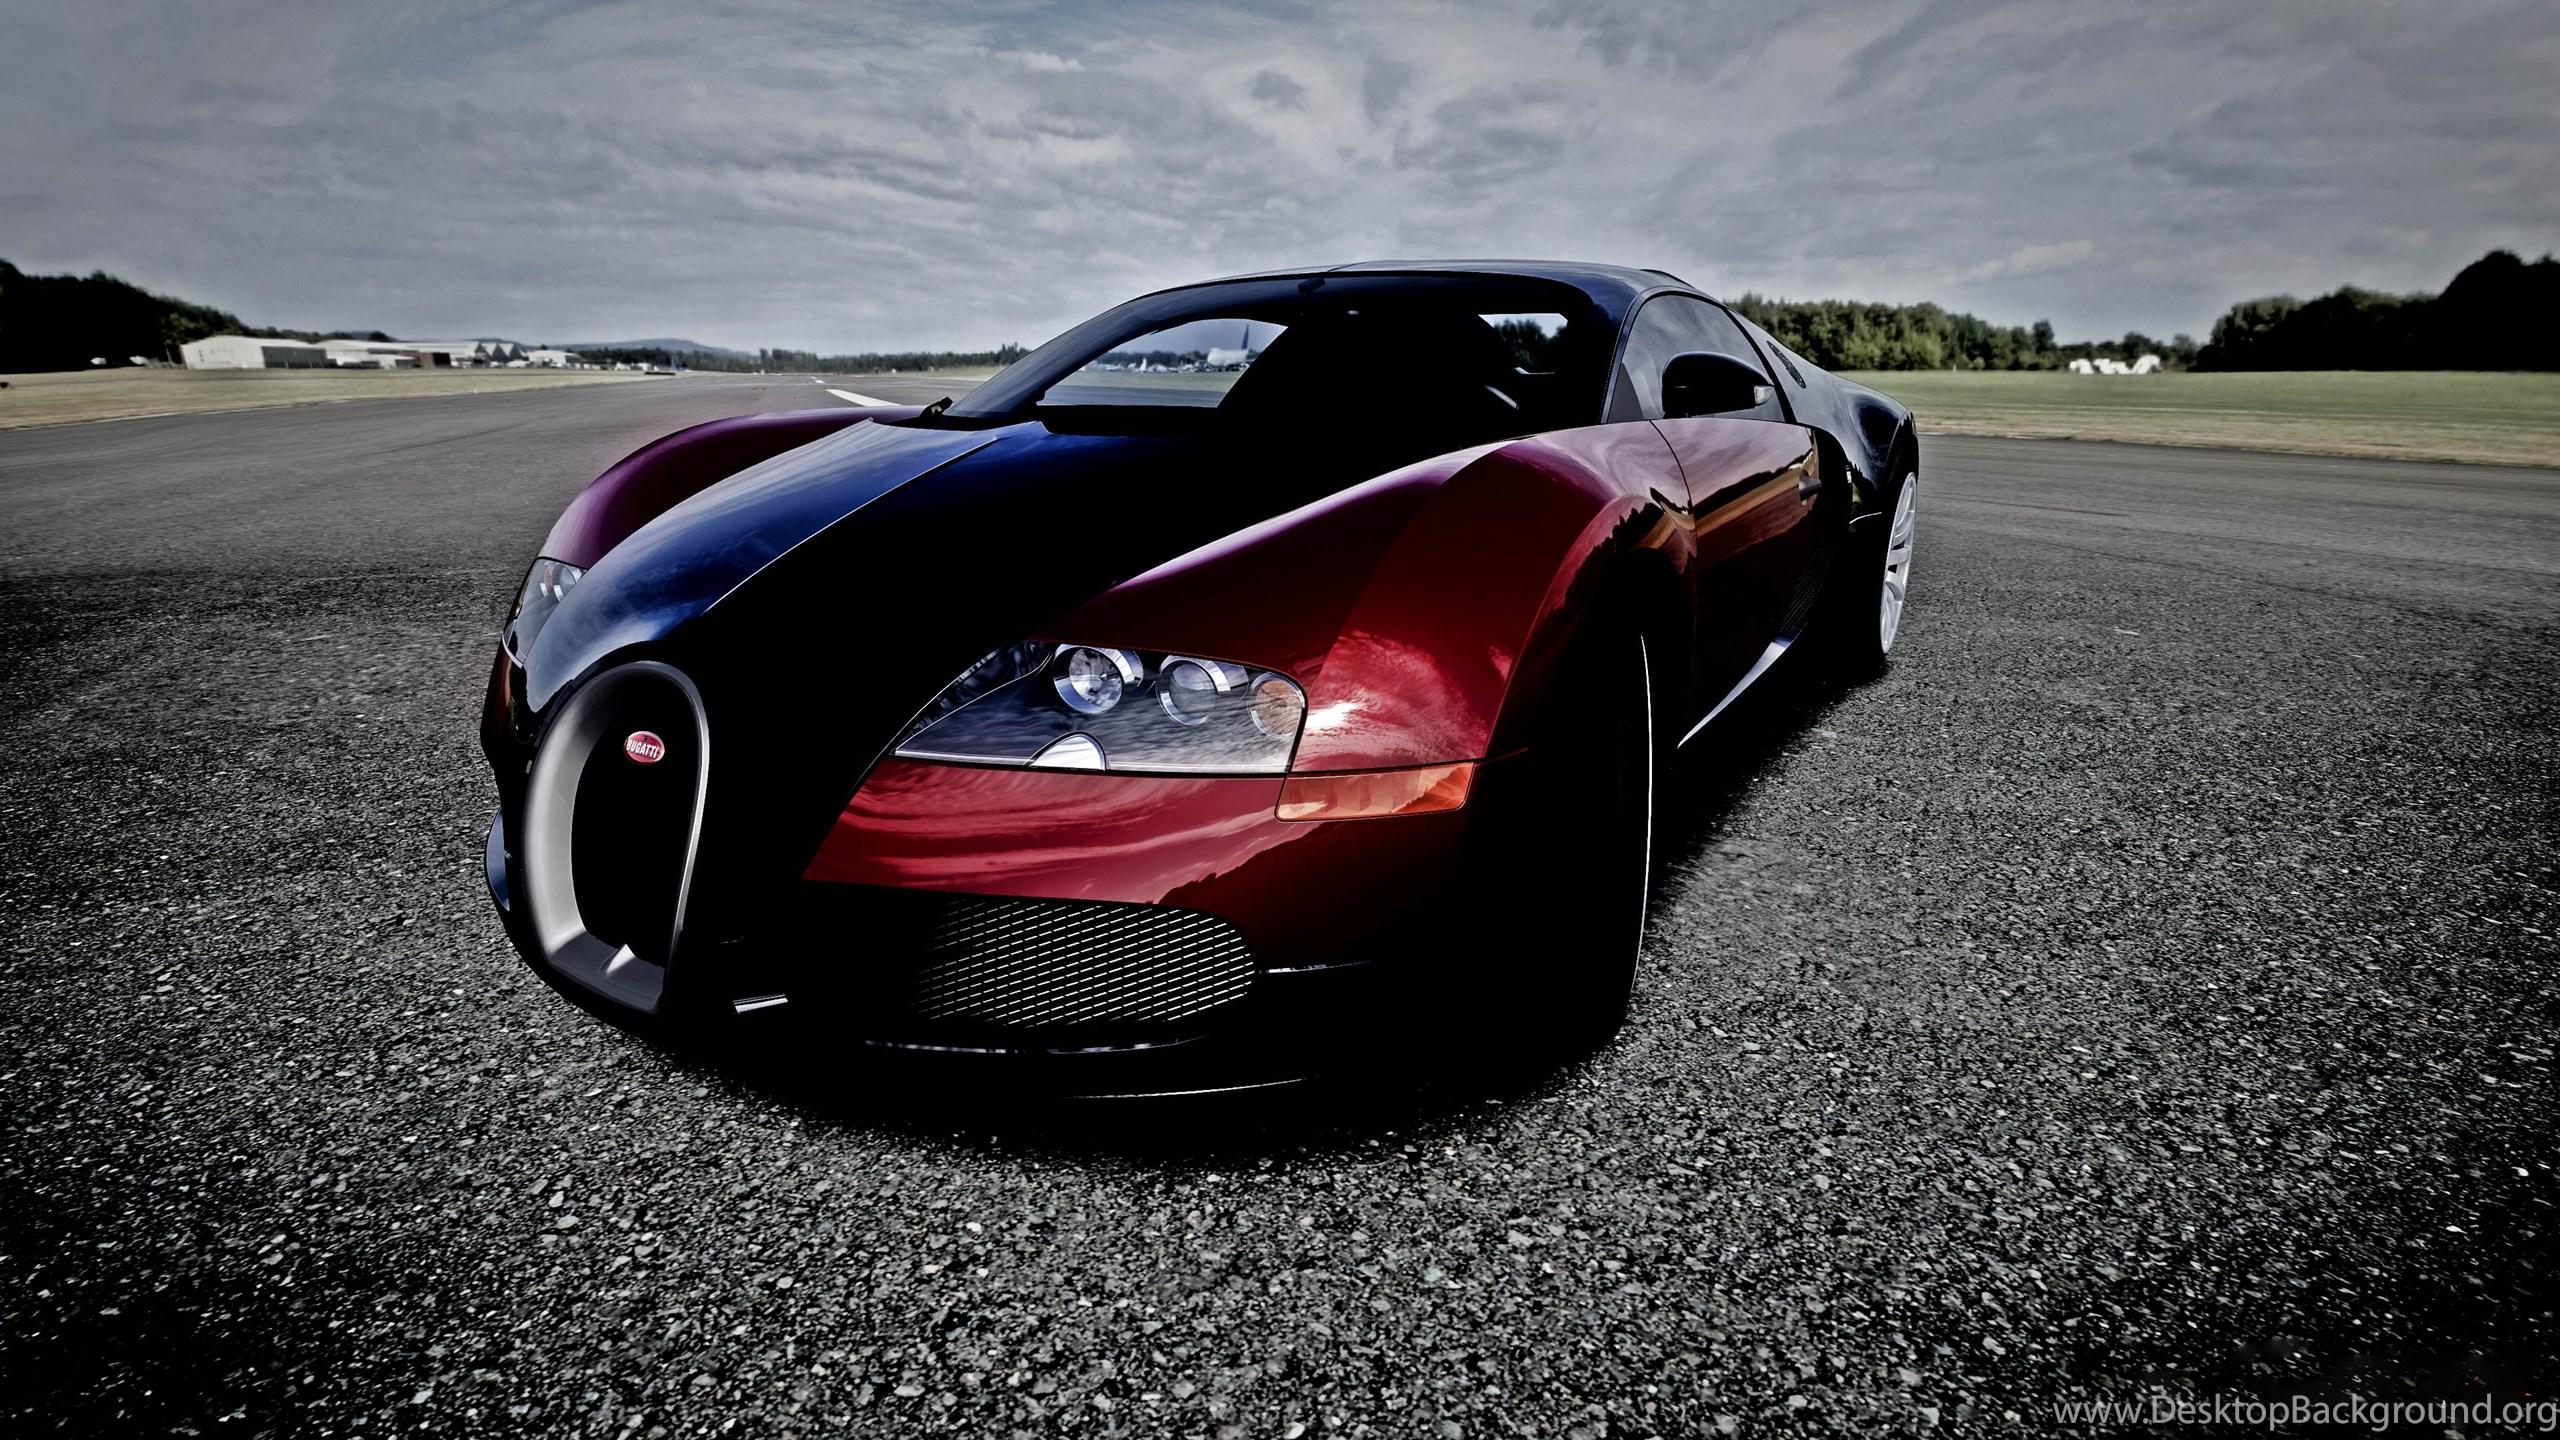 Latest Bugatti Car Wallpapers Free Download Wallpapers Desktop